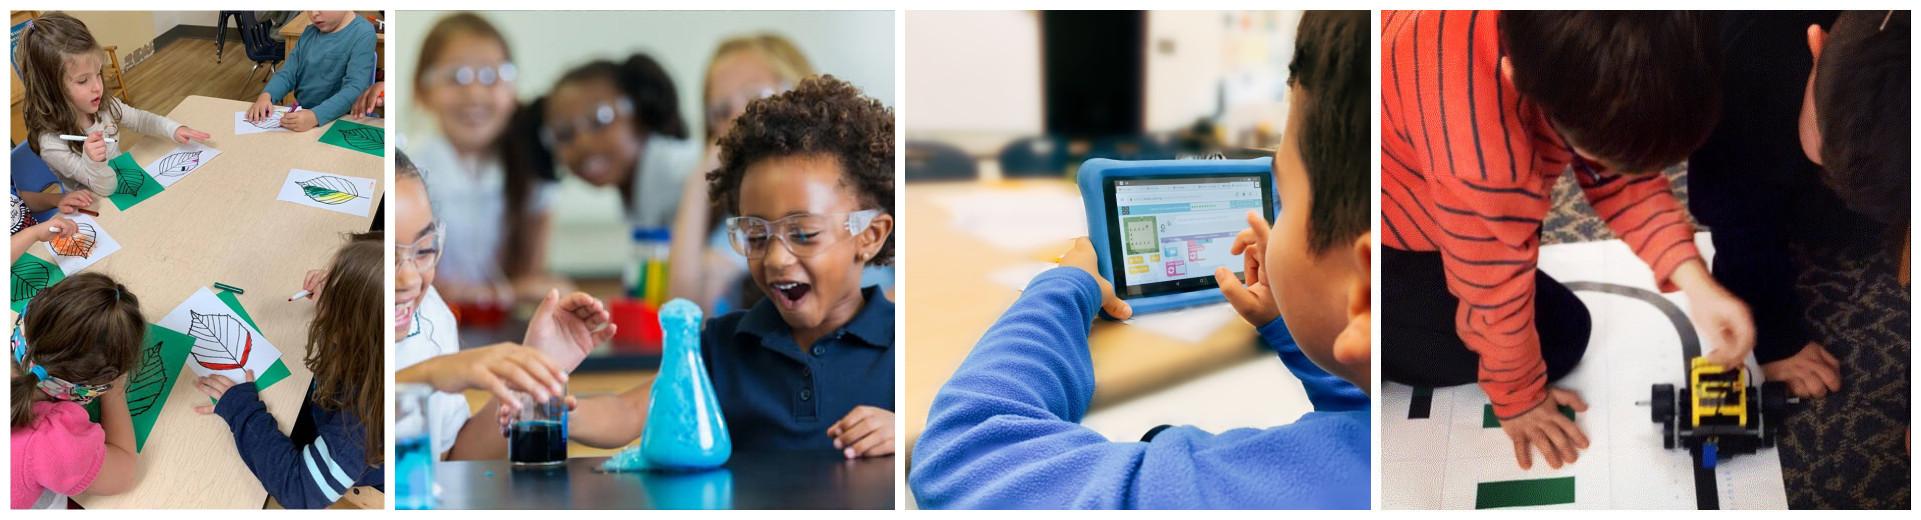 <b>美国STEAM教育第一品牌小迷科加盟机会</b>